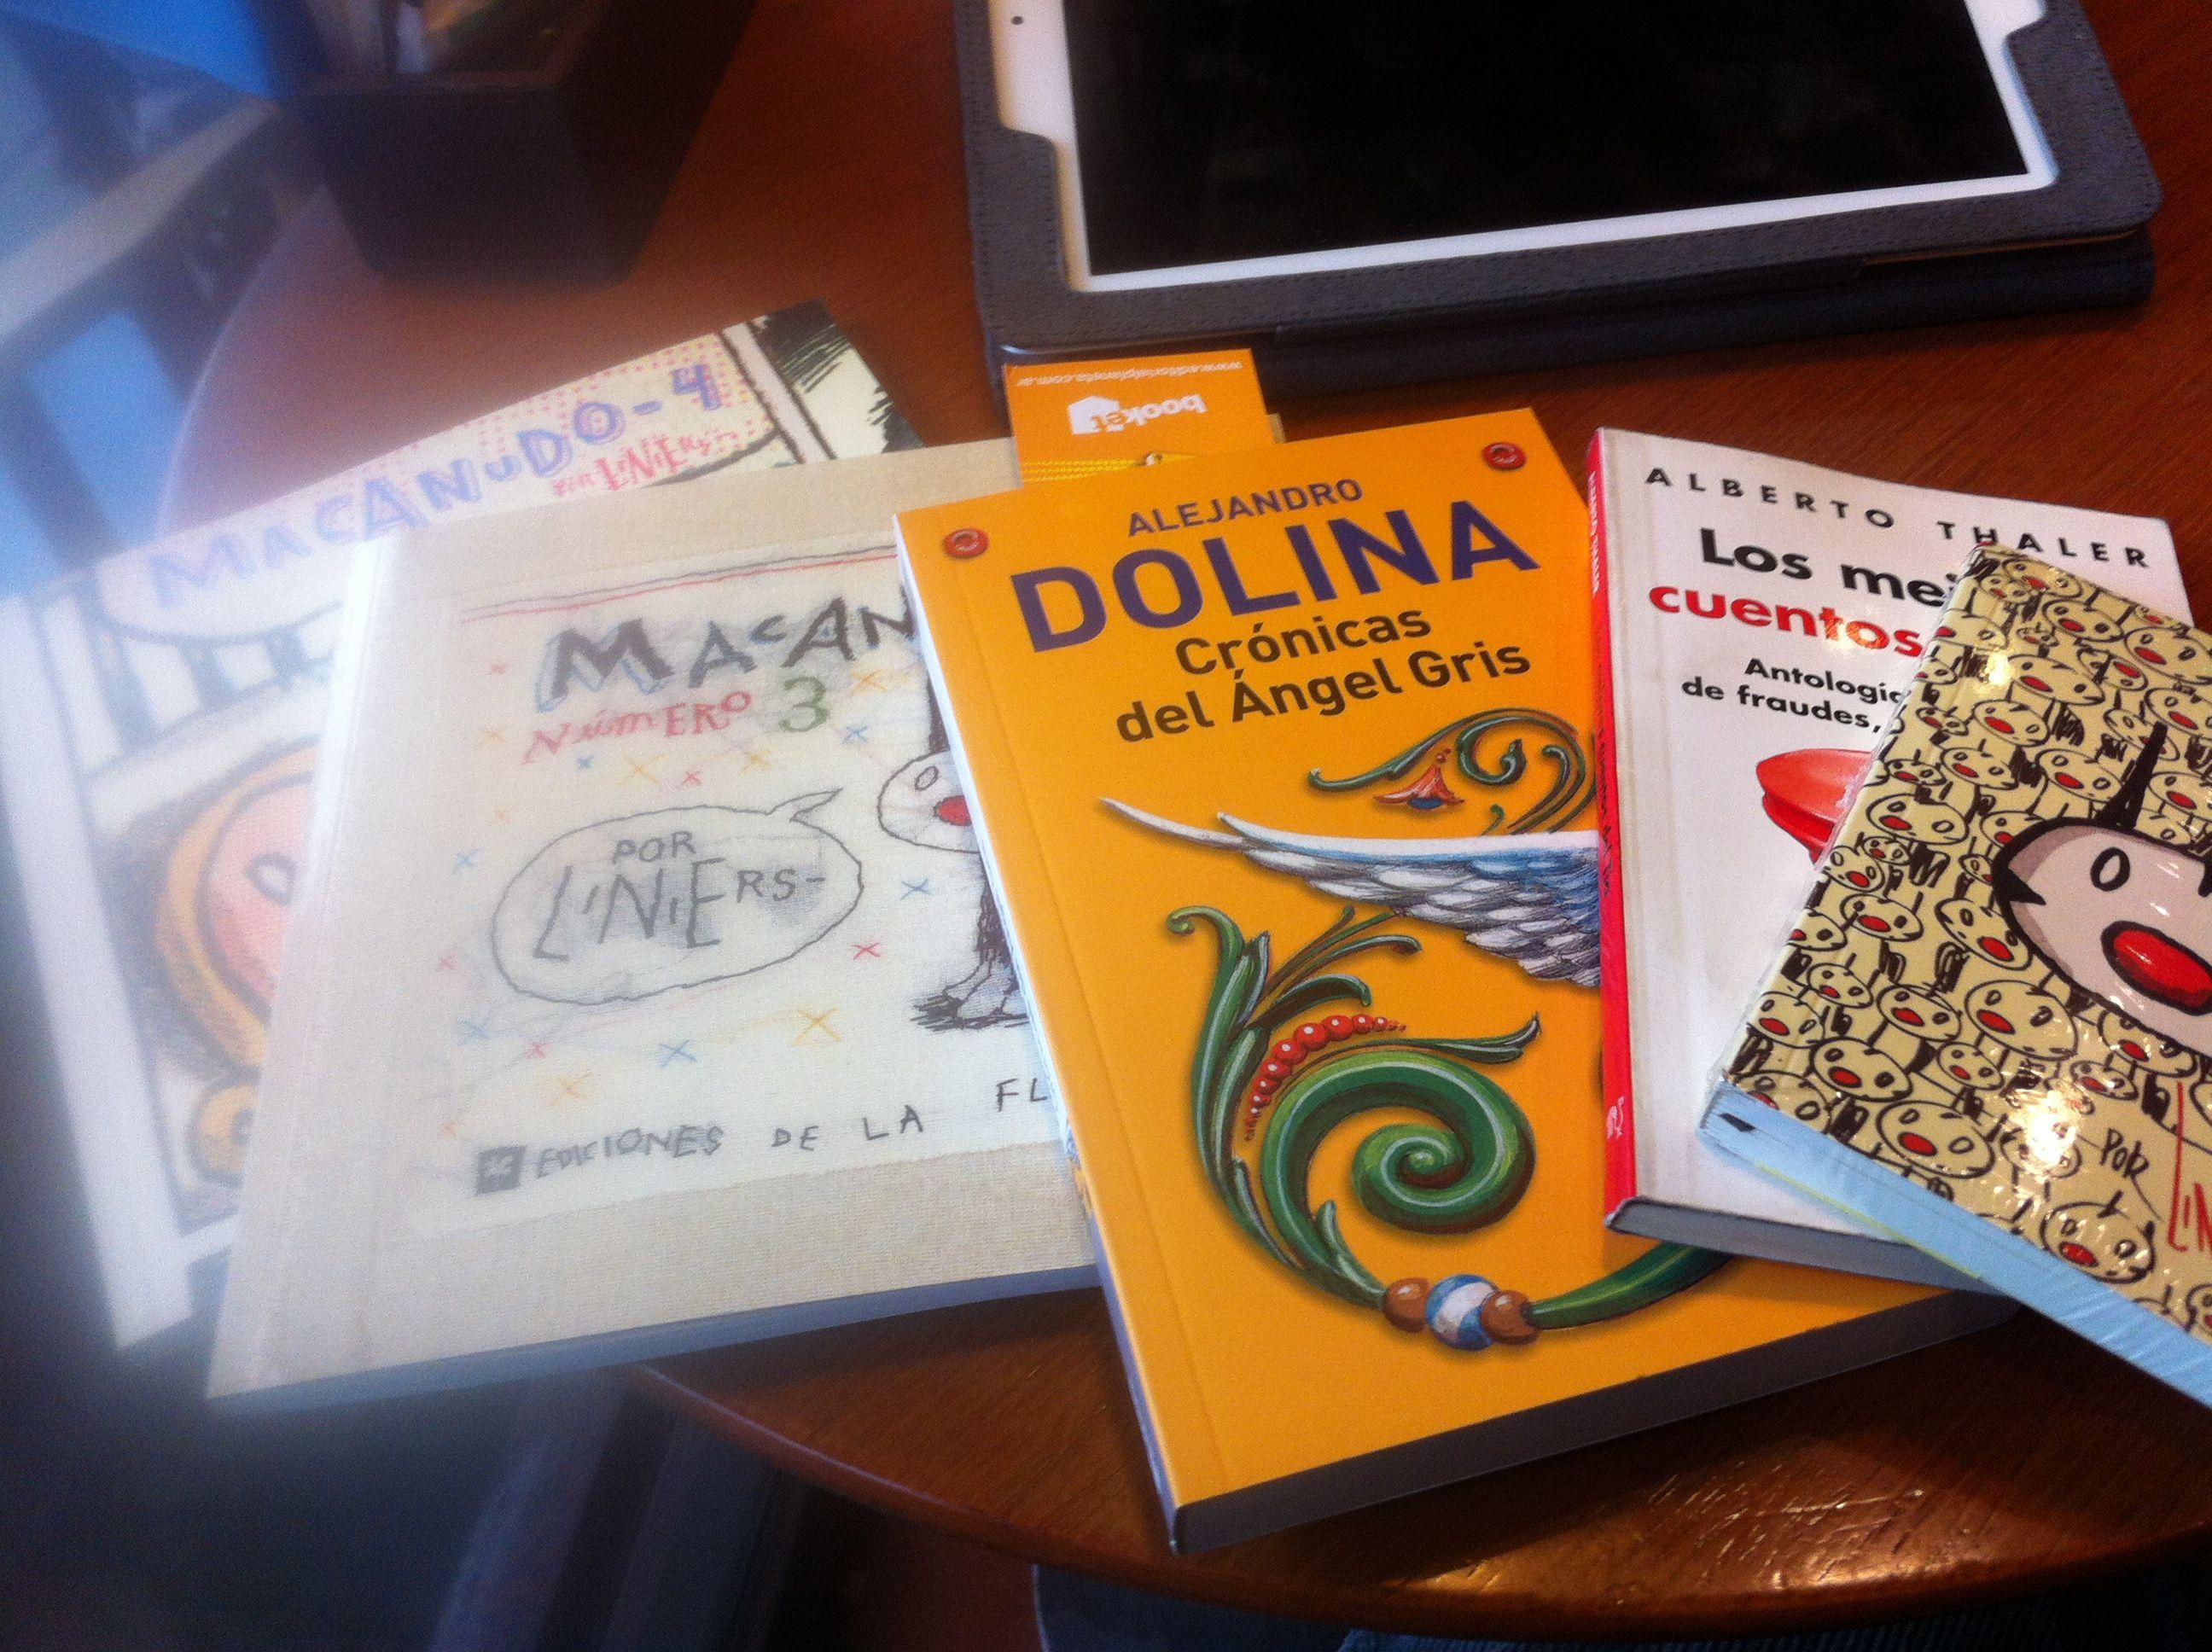 Dolina, Liniers y Thaler